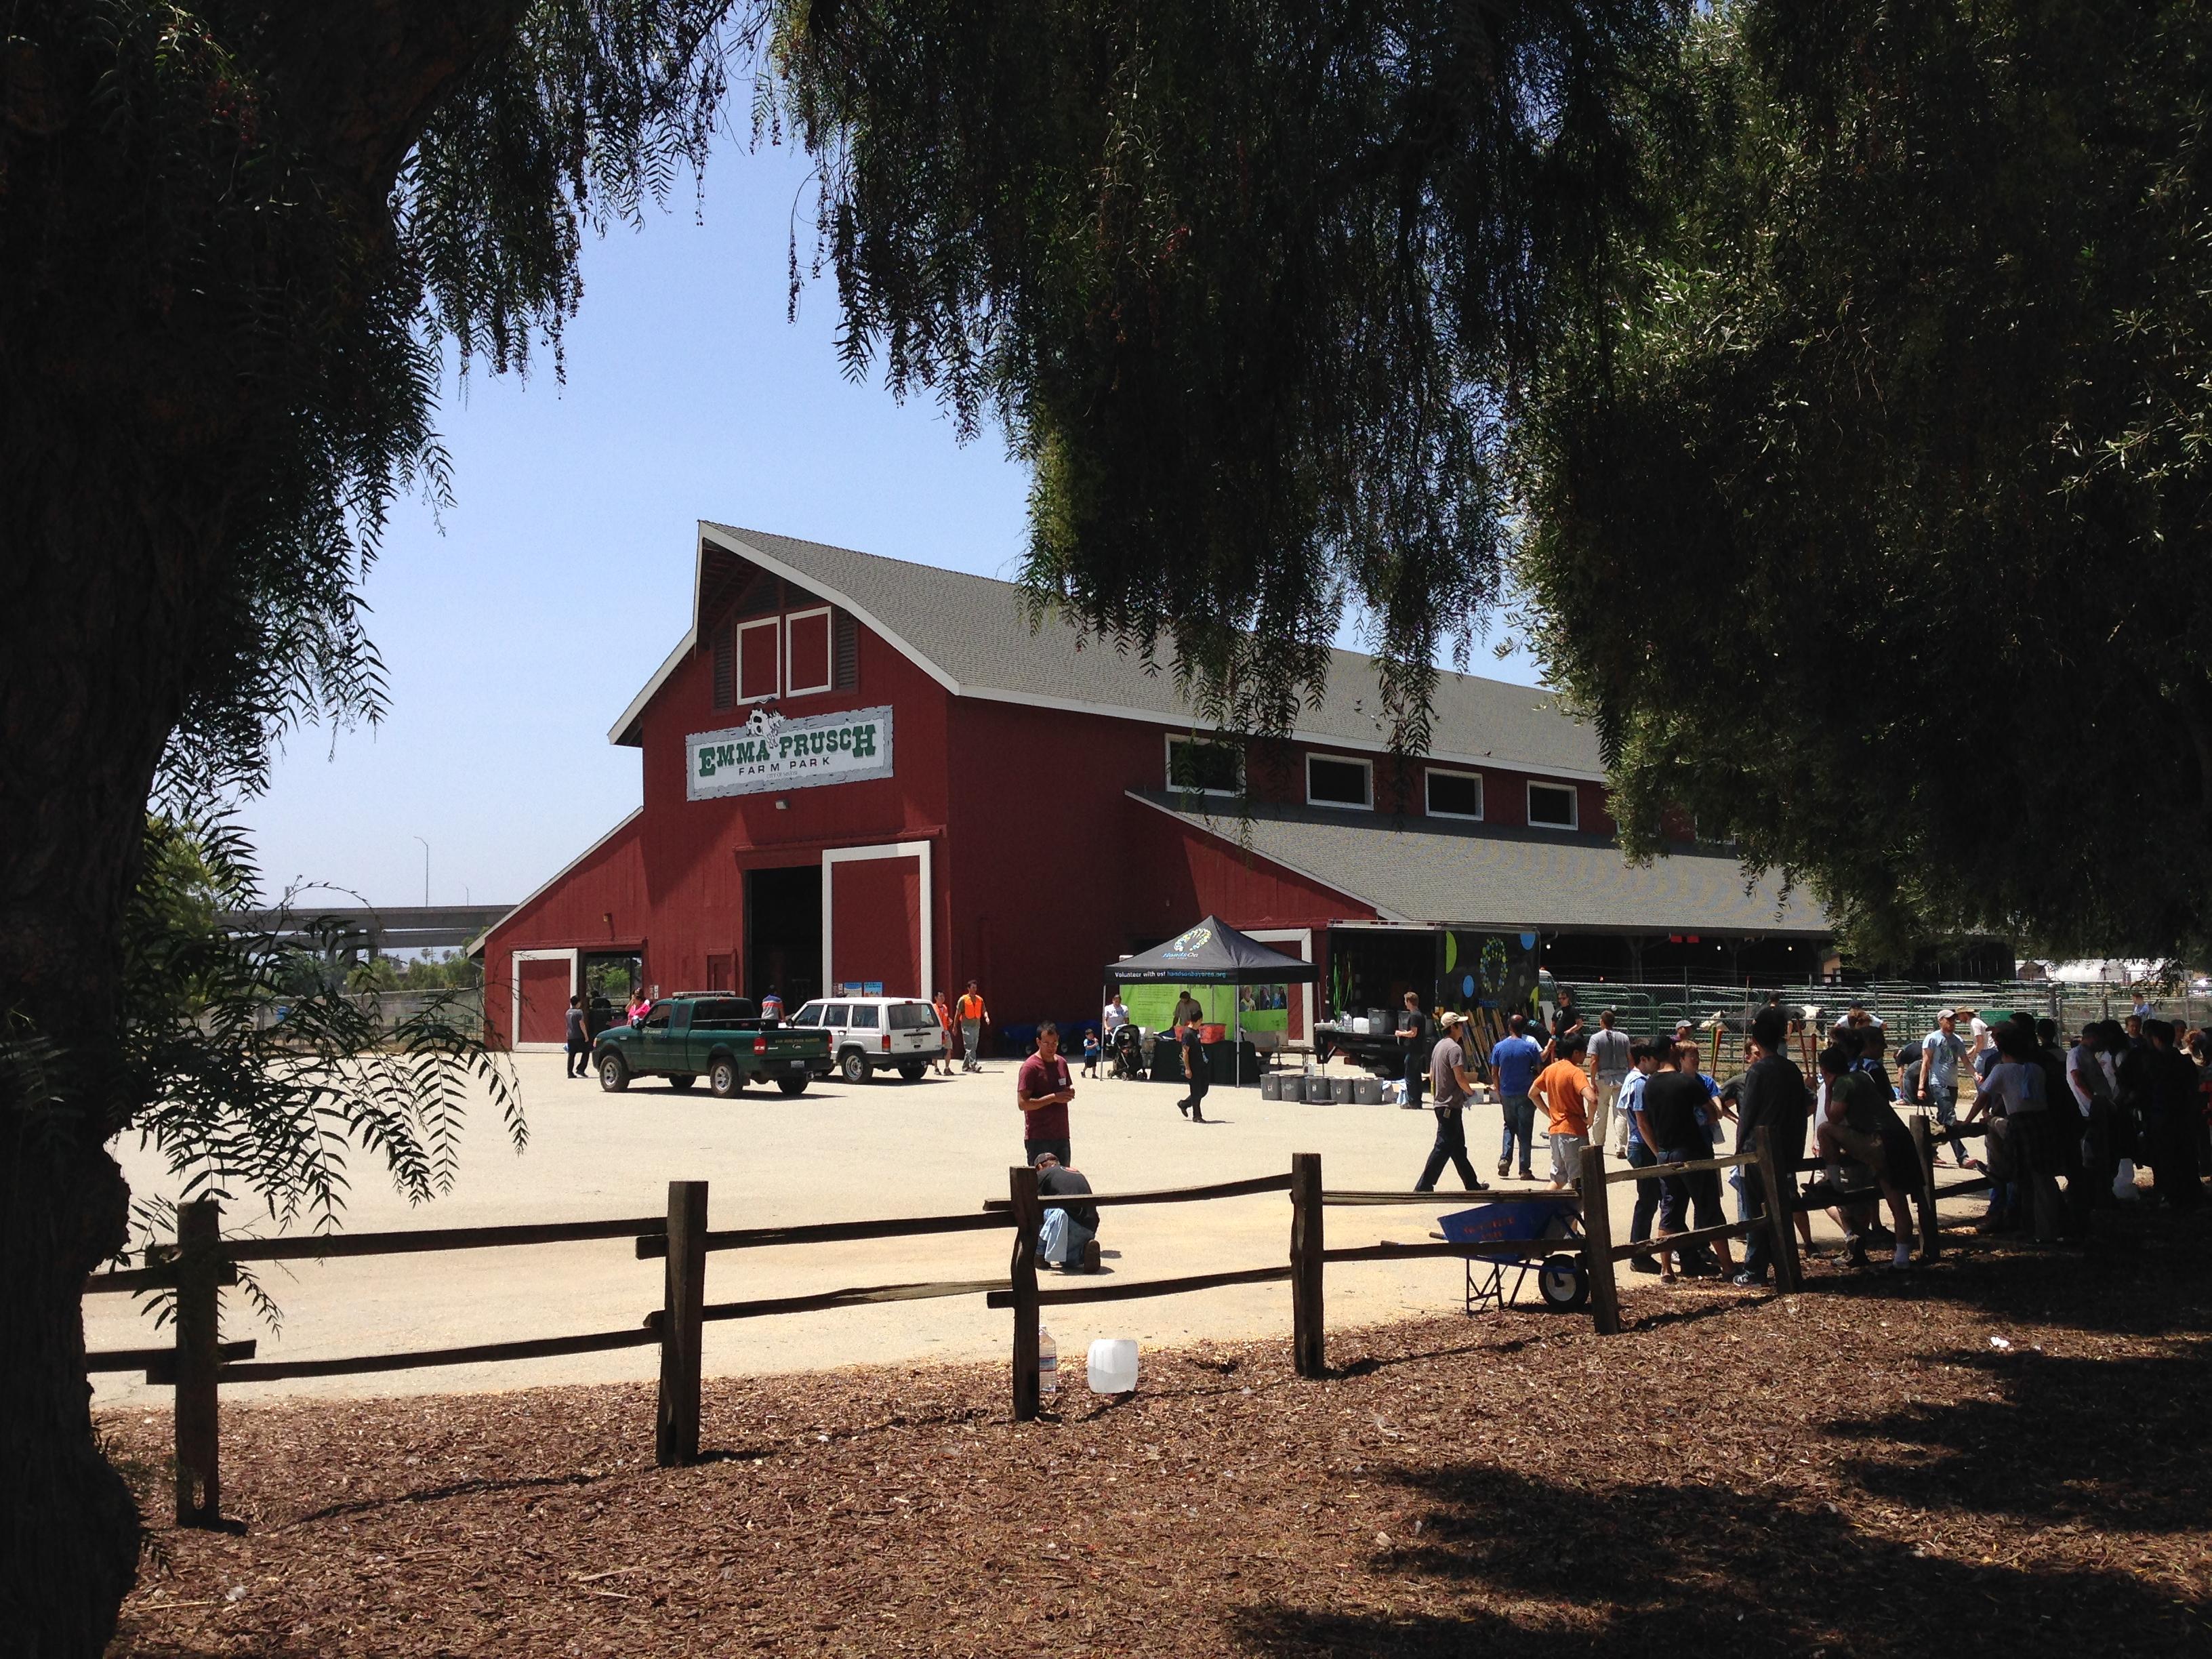 Emma Prusch Farm Park